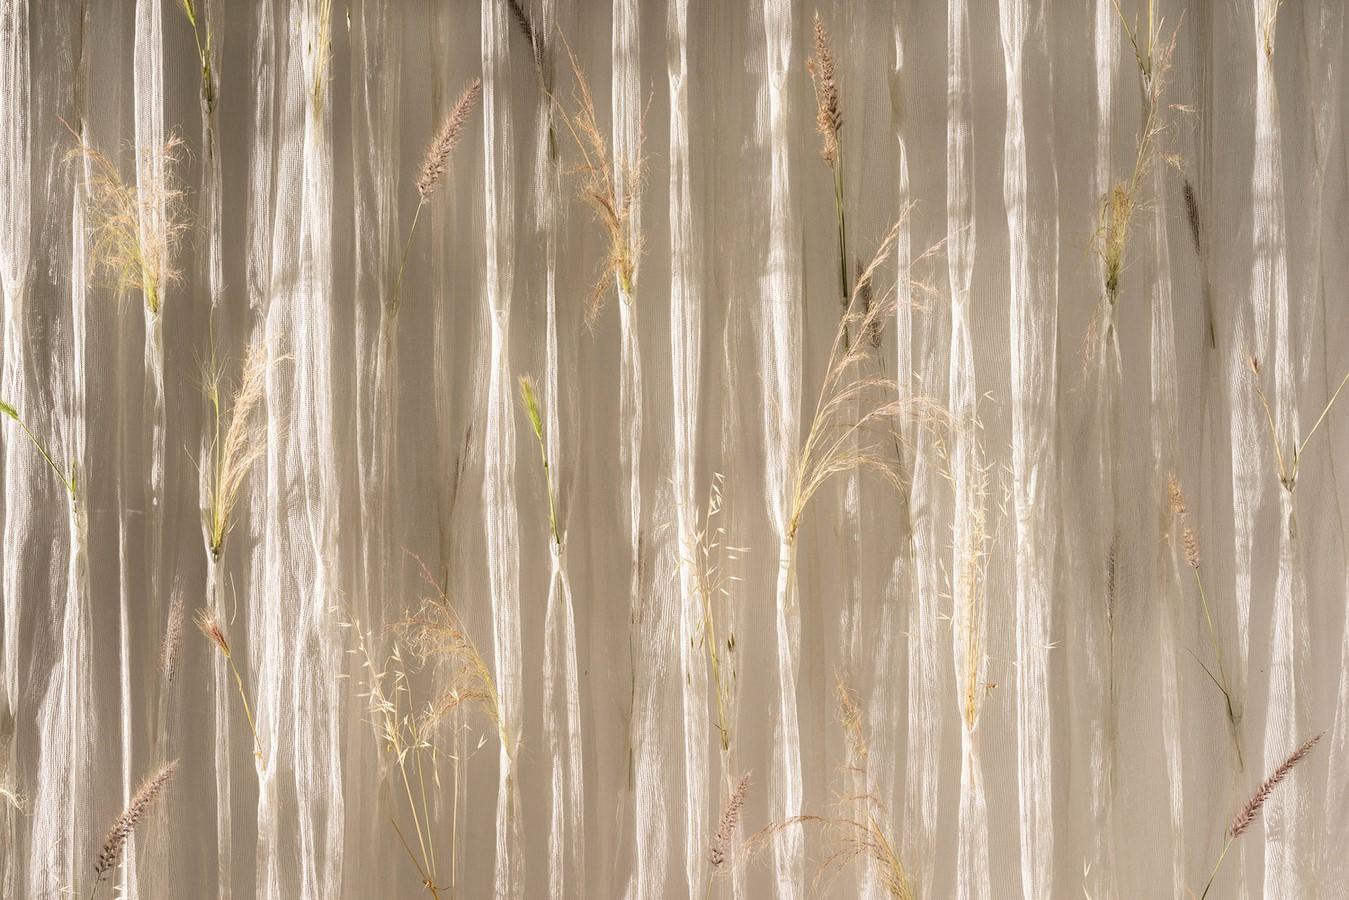 Draped Flowers (Curtain) - Sheet1